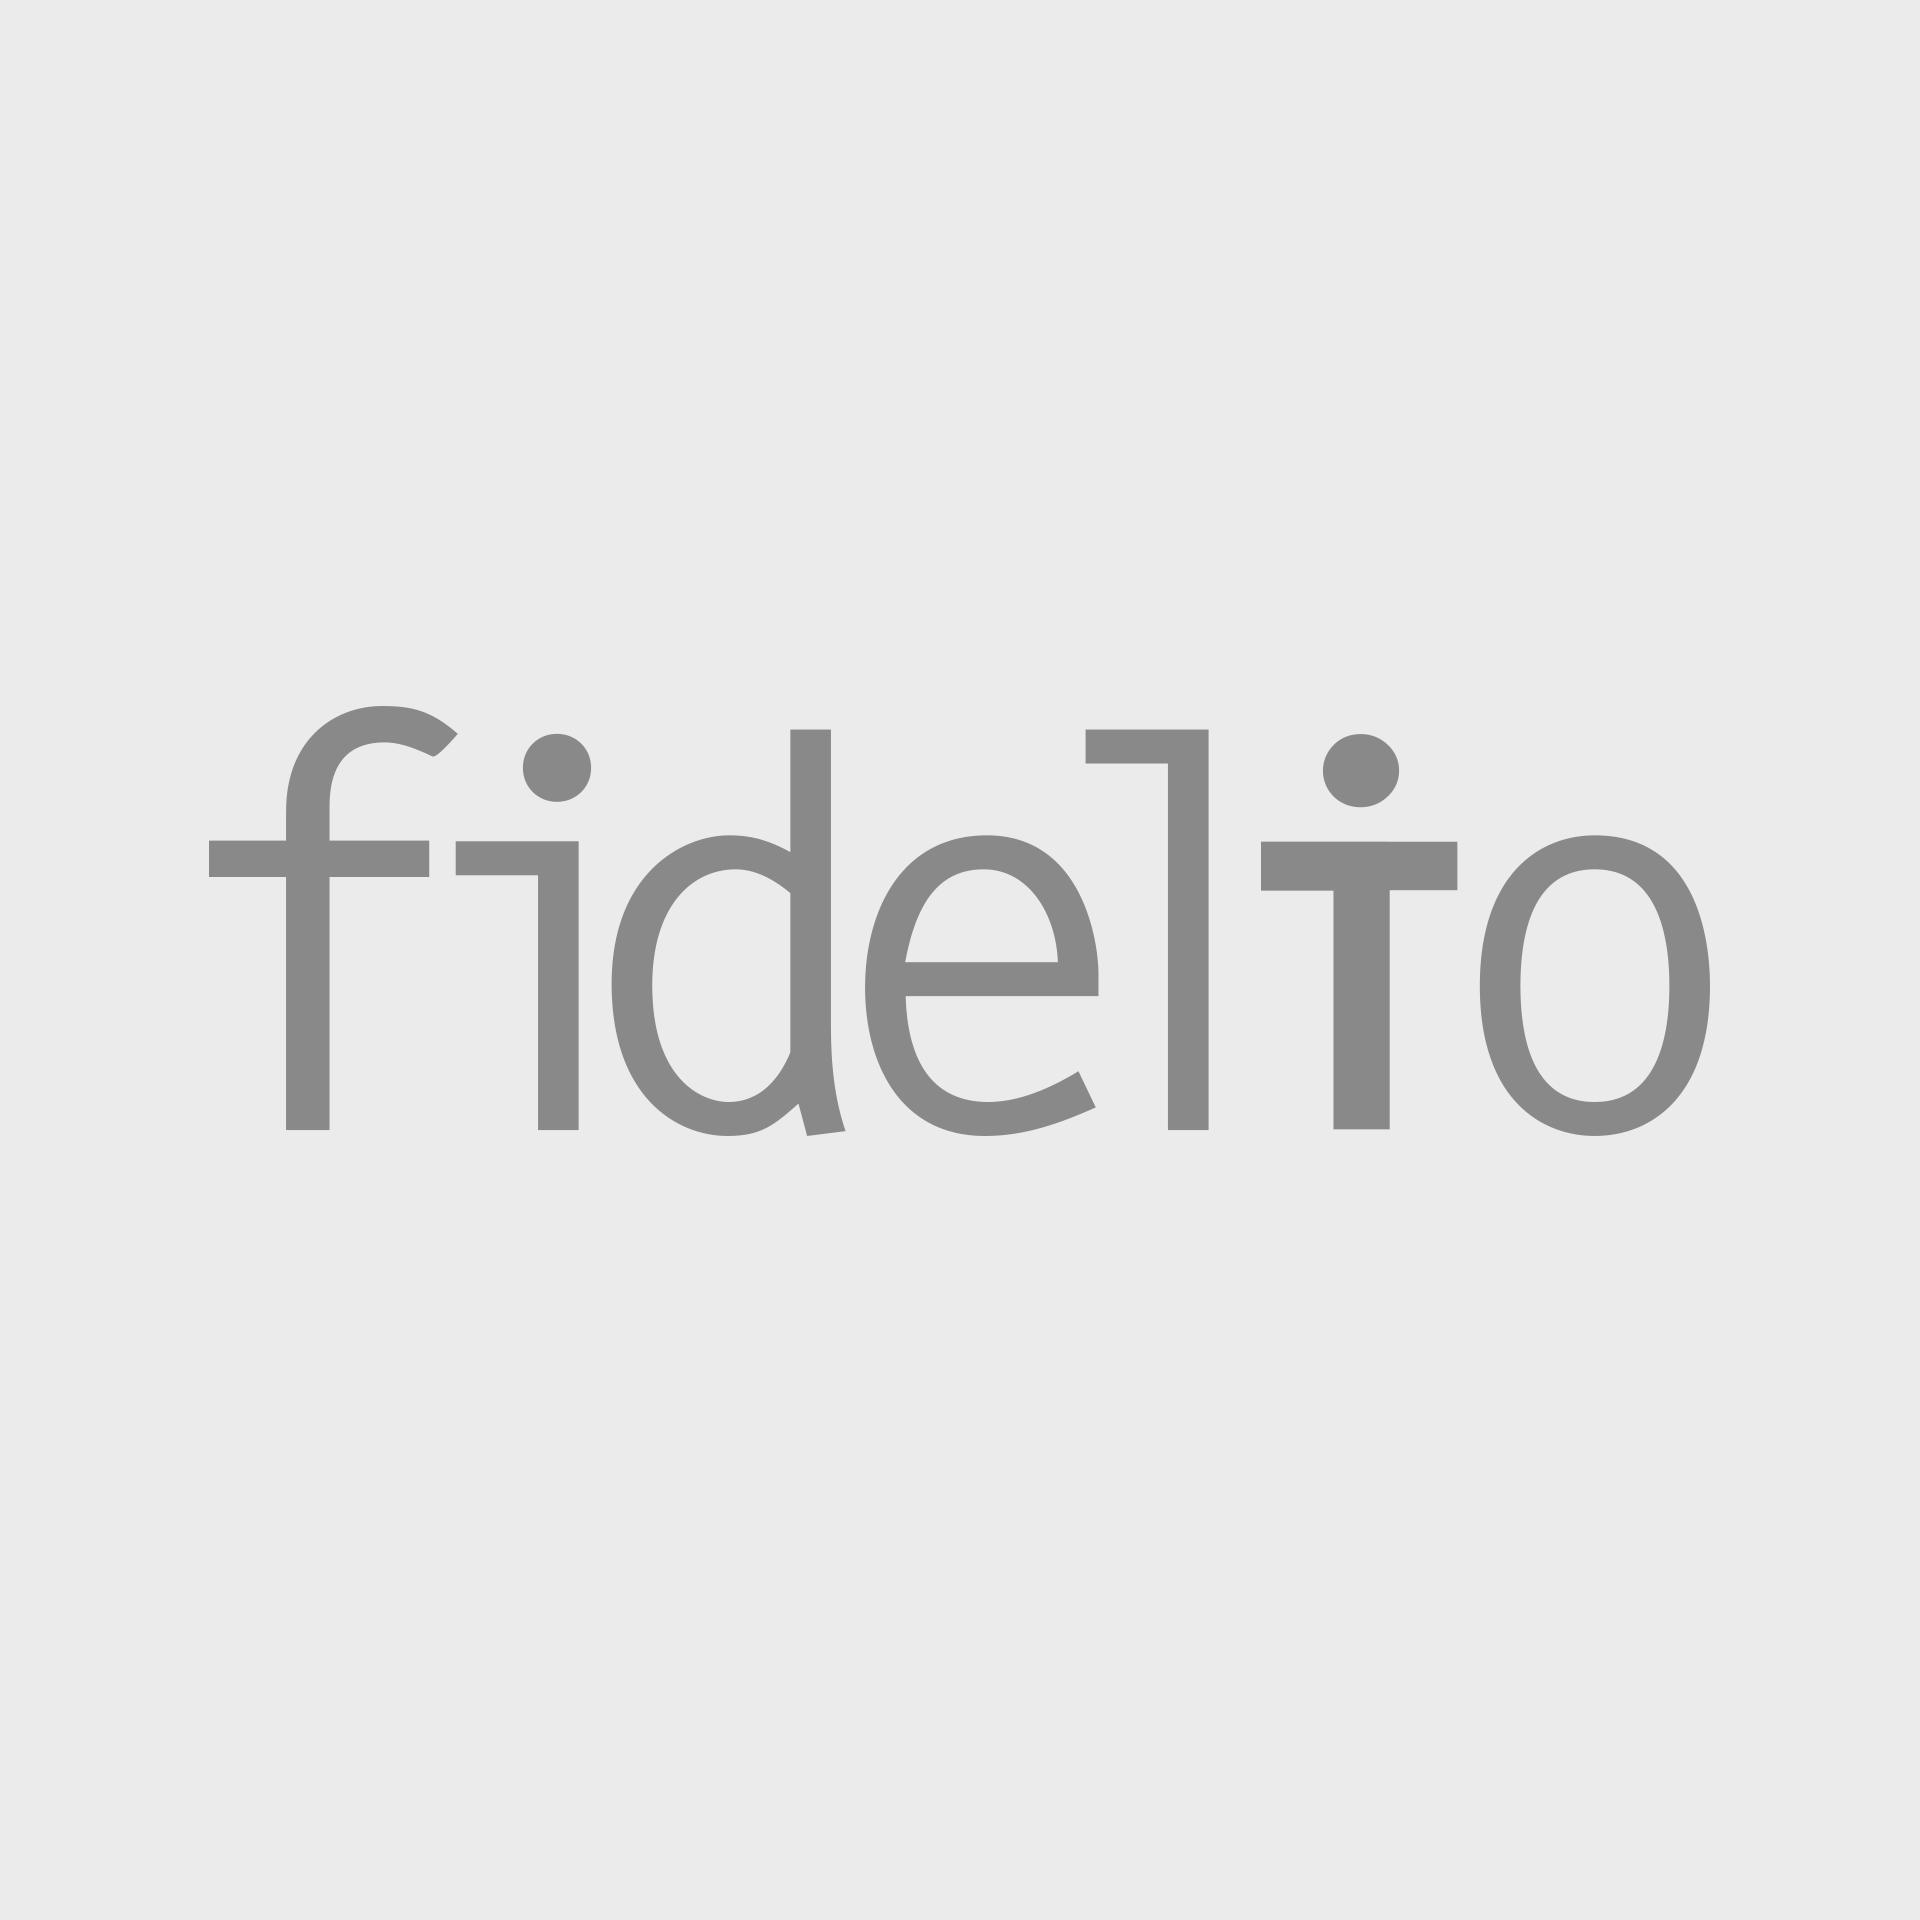 Fidelio Napi Zene: Audrey Hepburn a Moon Rivert énekli